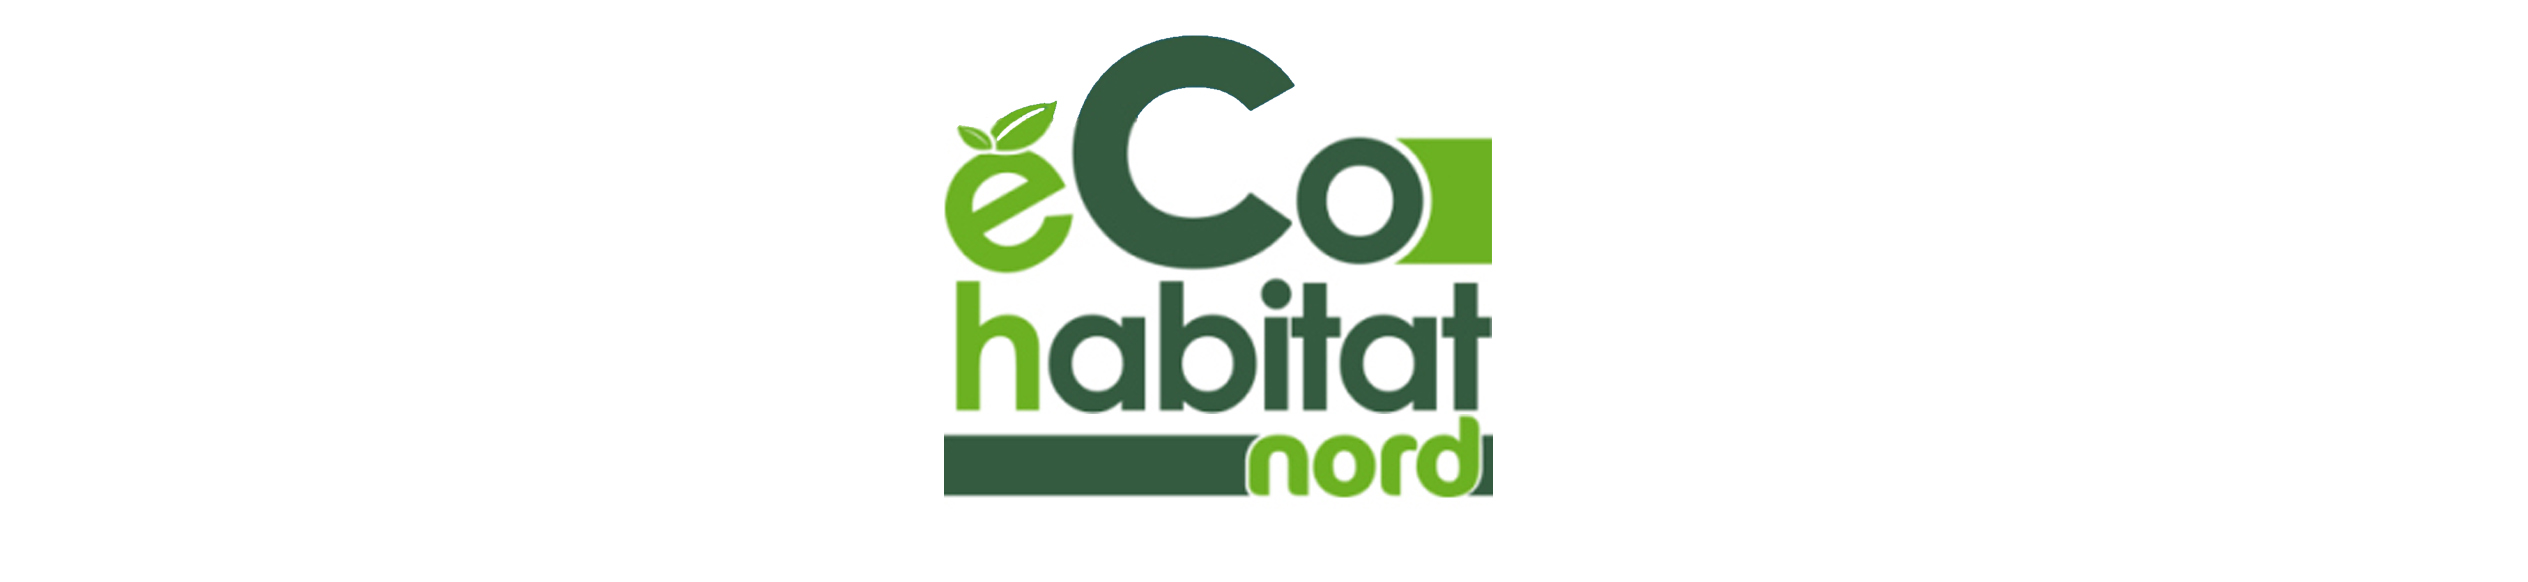 bandeau_ecohabitatnord